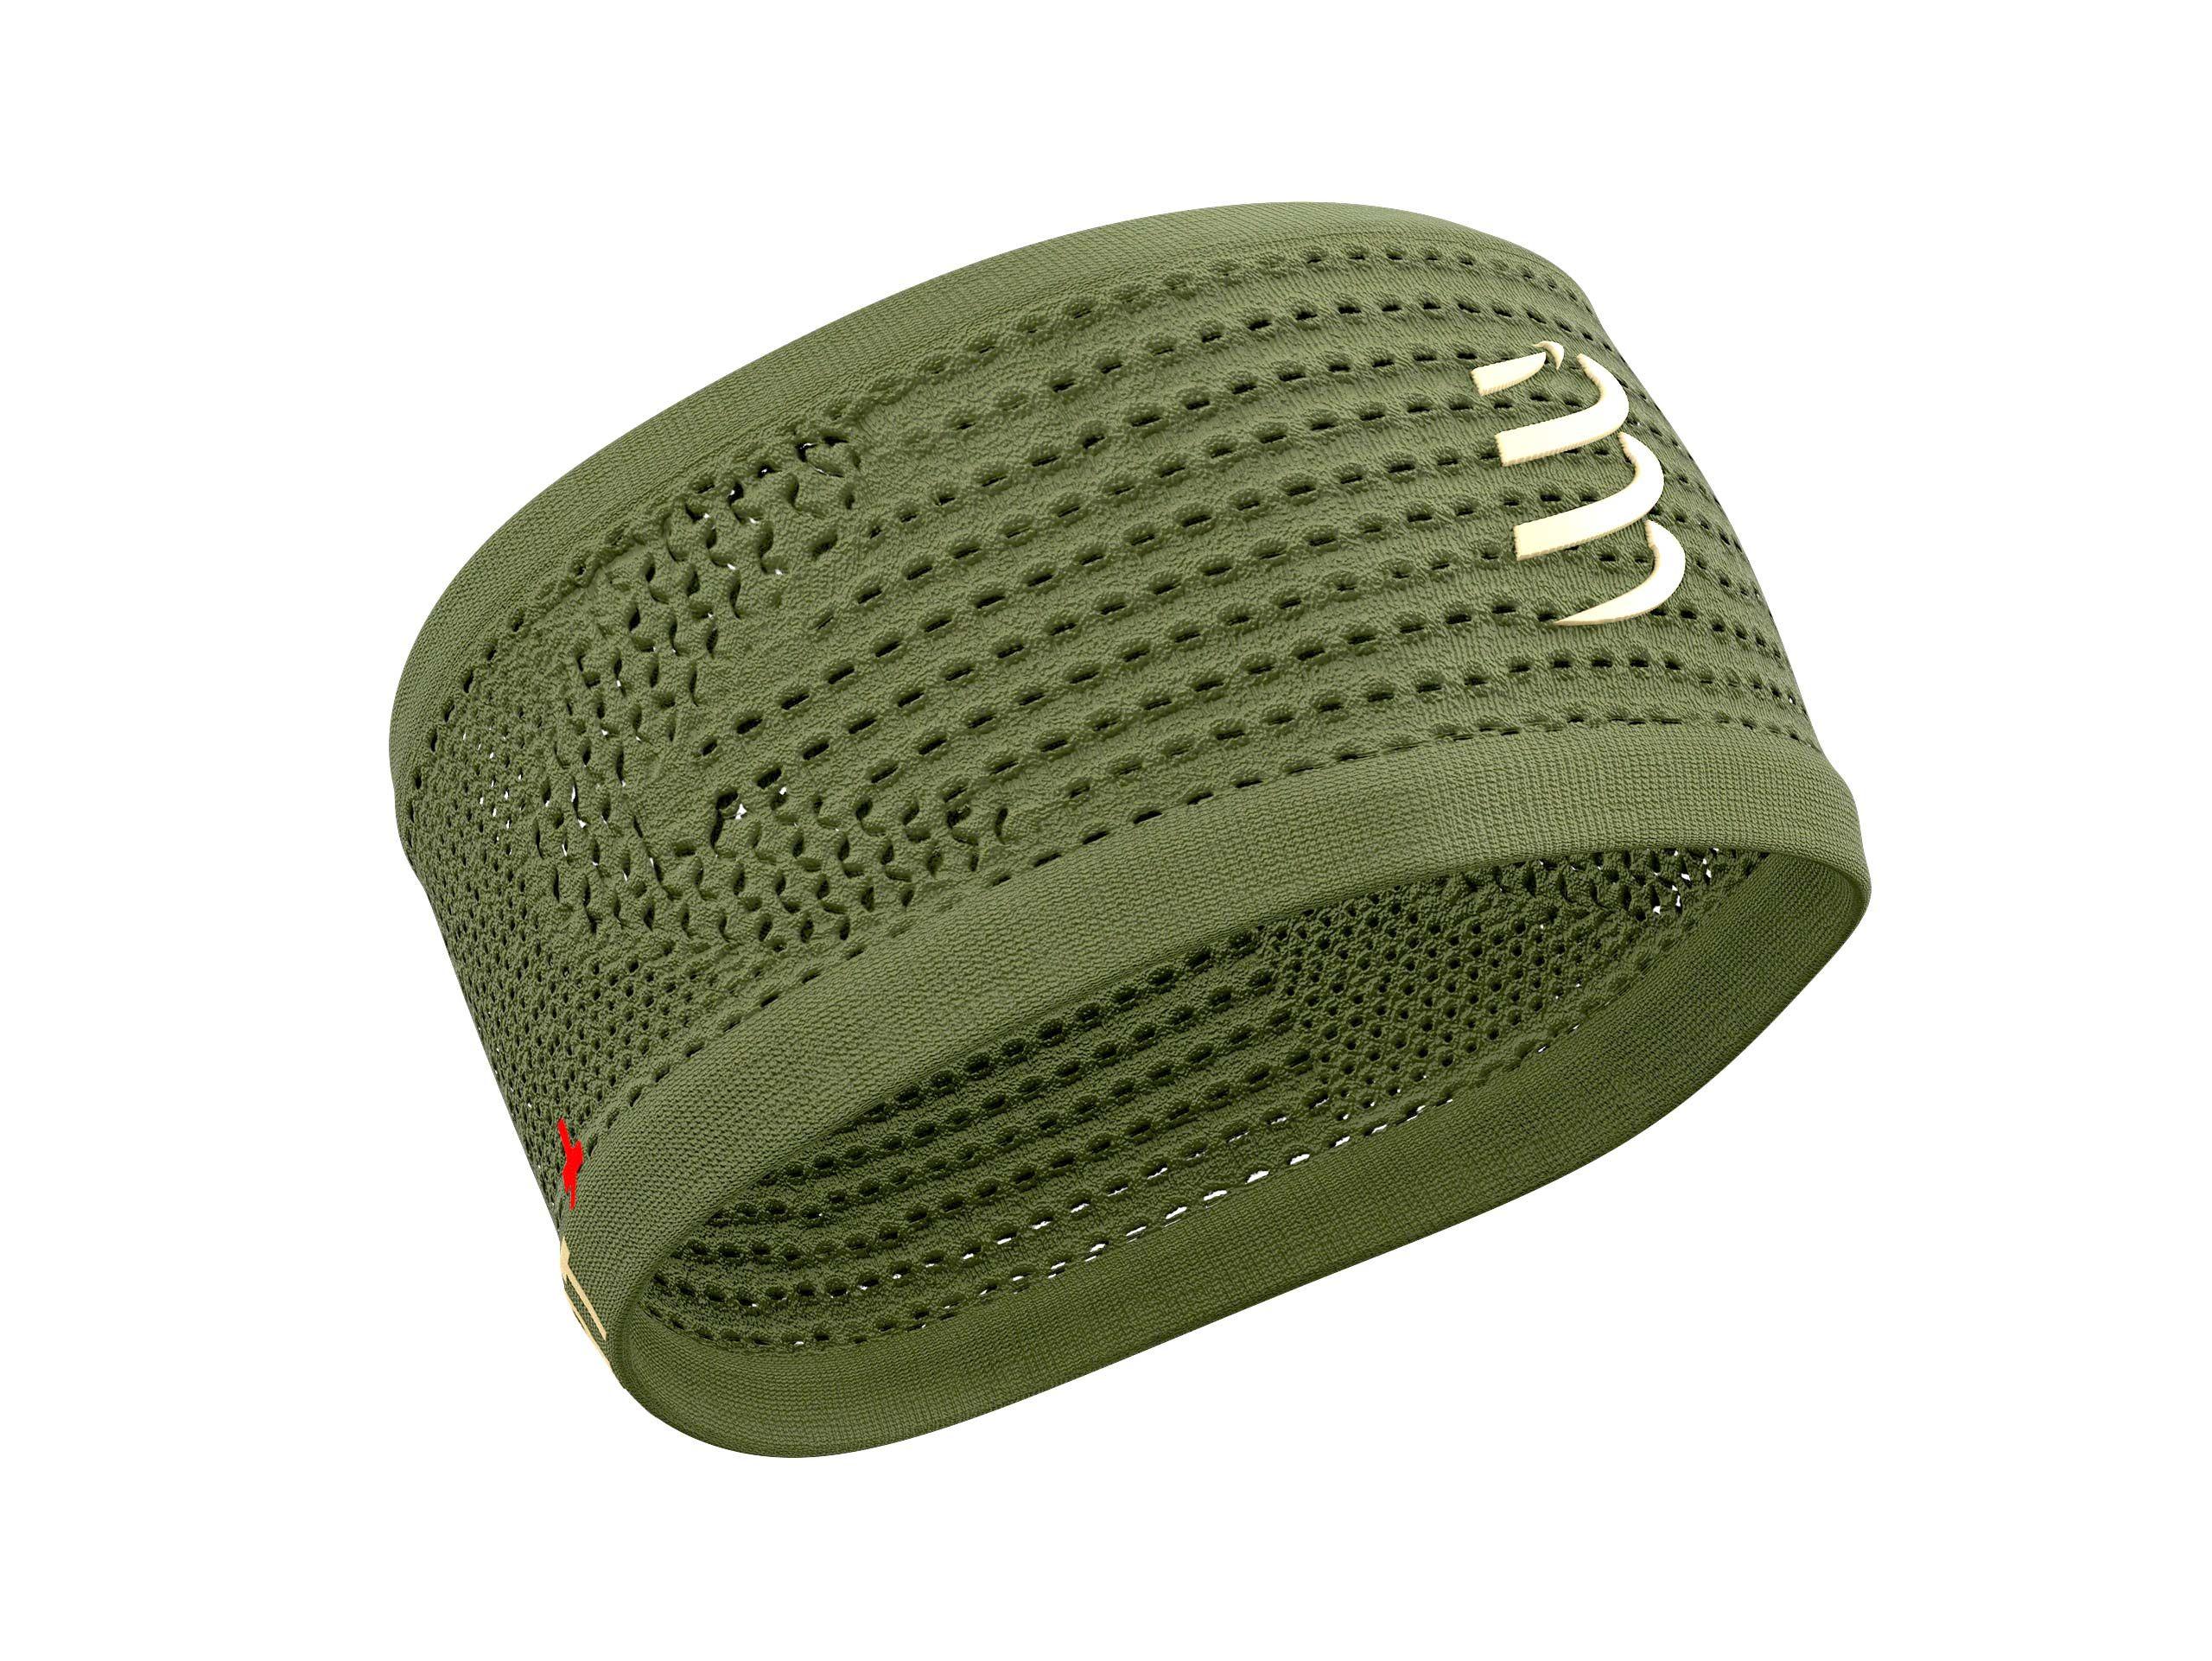 Headband On/Off - Dusty Olive